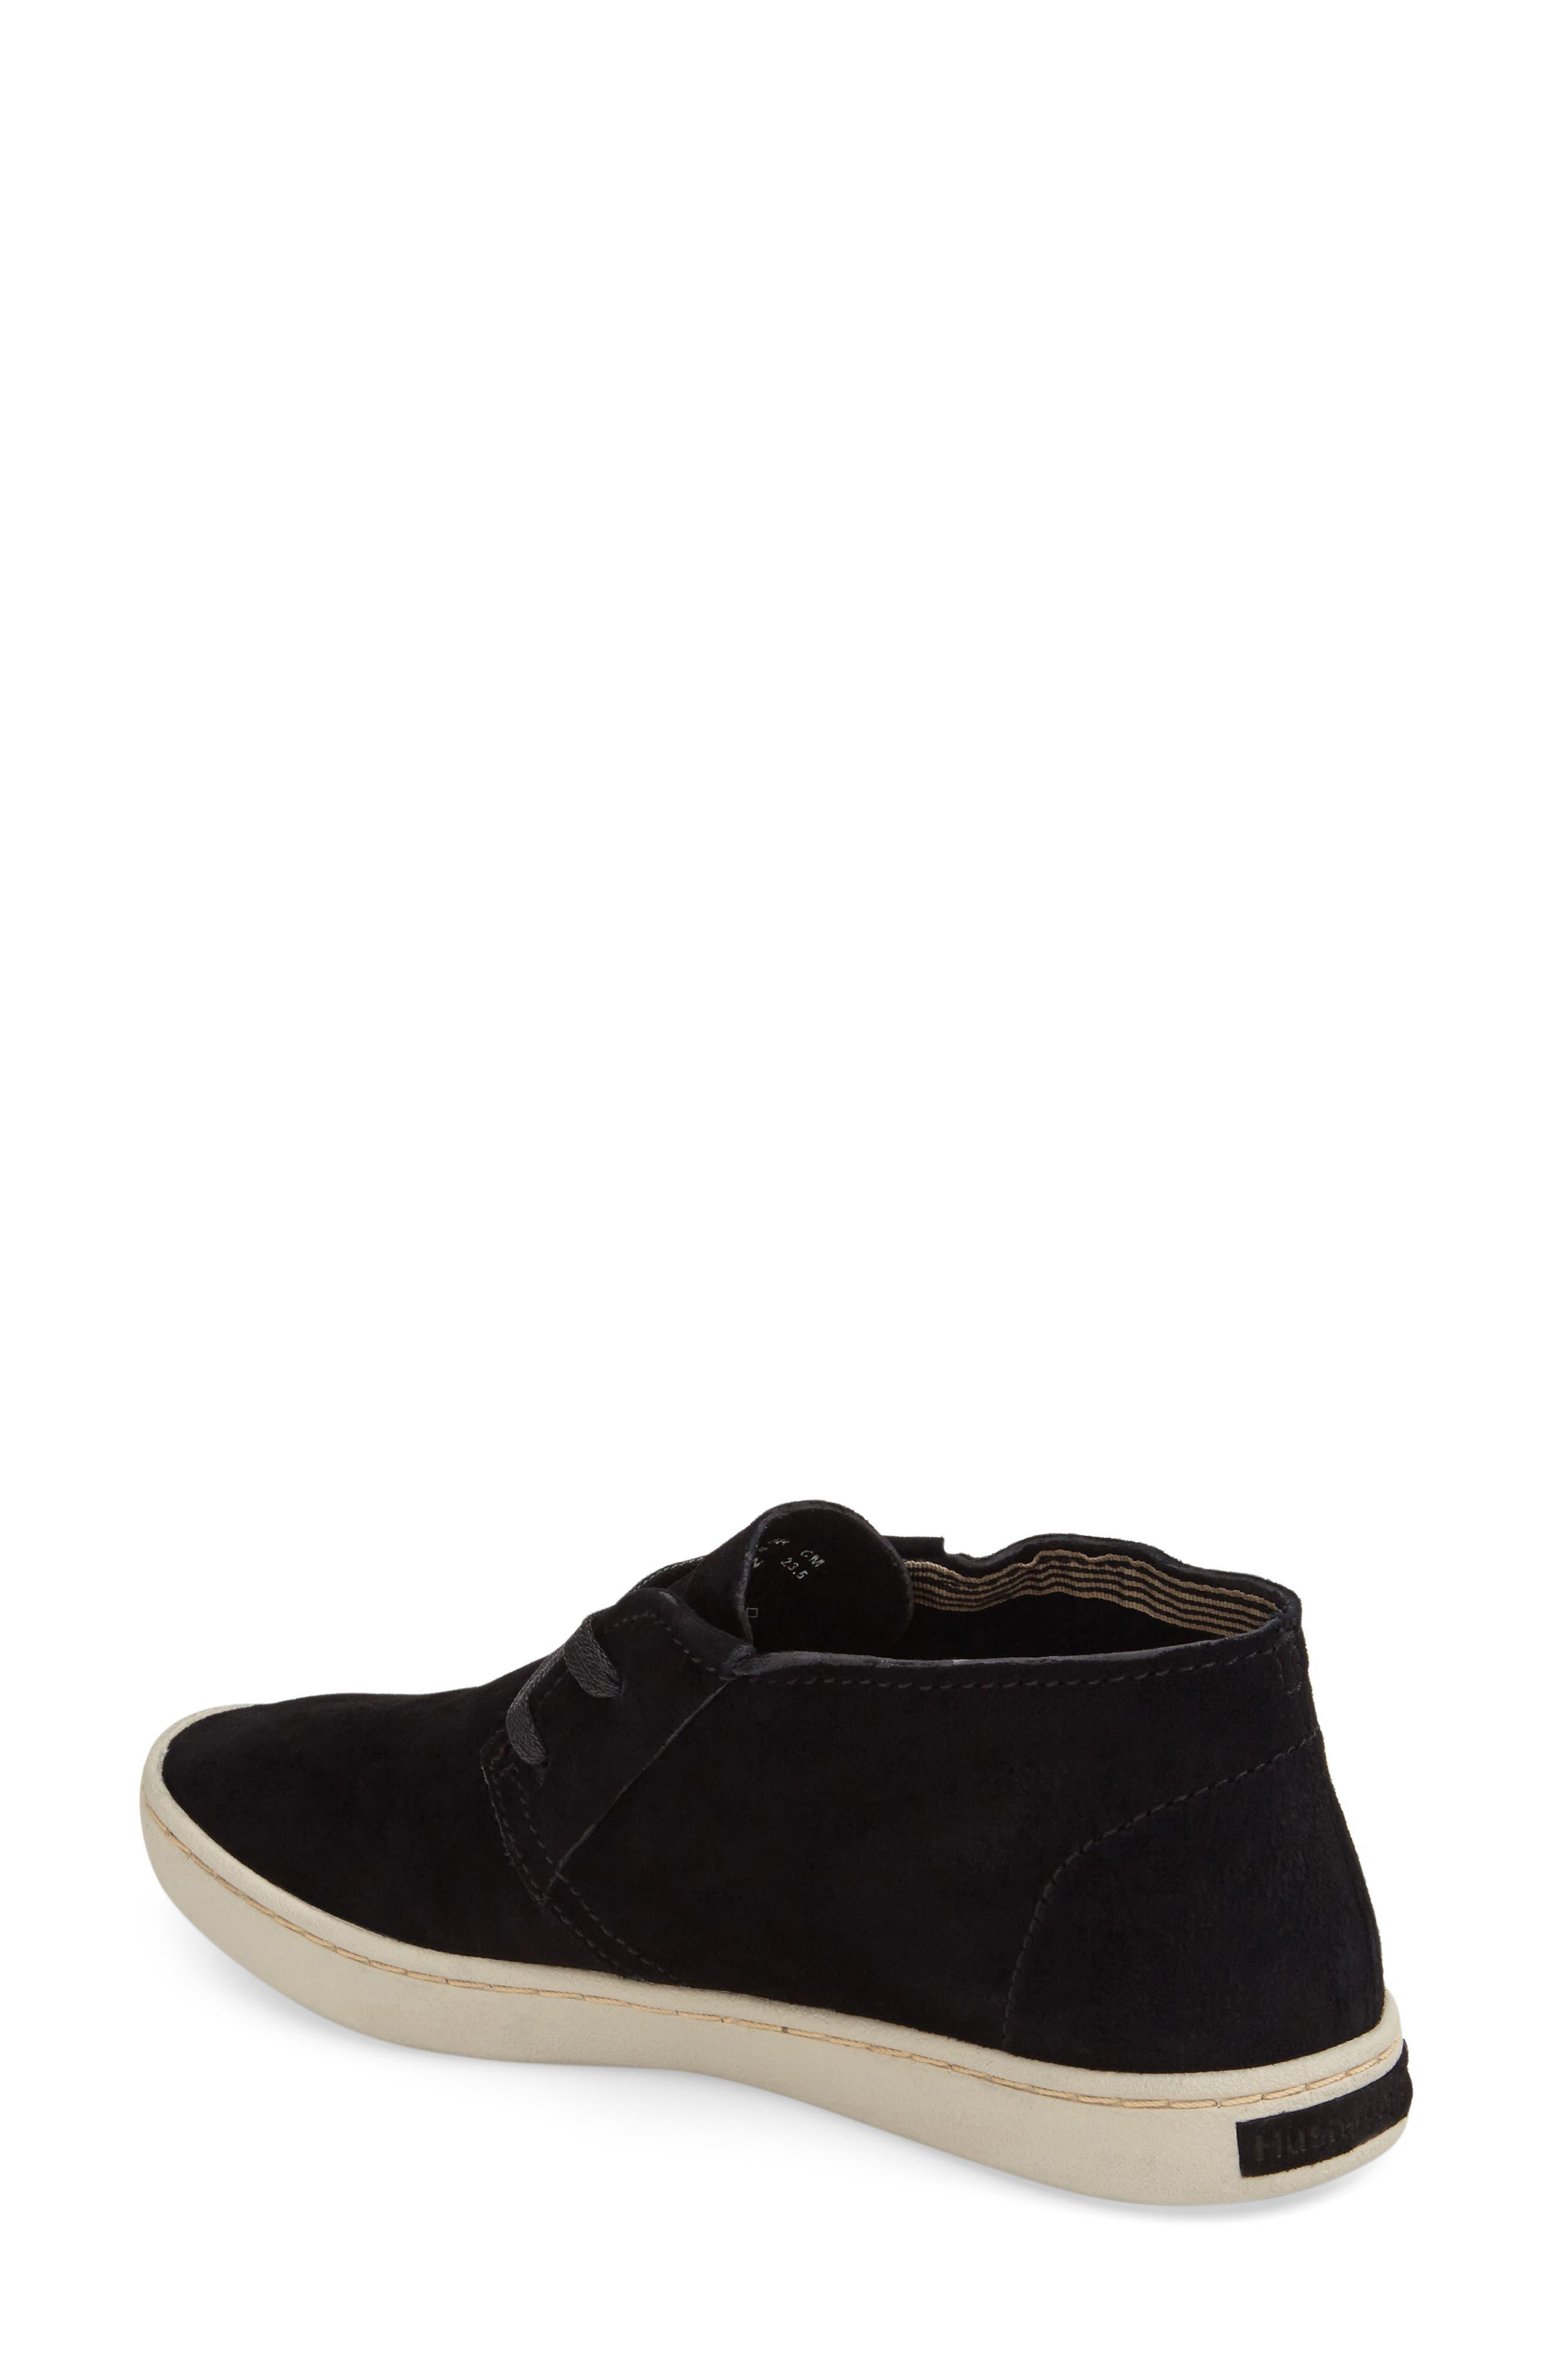 'Cille Gwen' Sneaker,                             Alternate thumbnail 11, color,